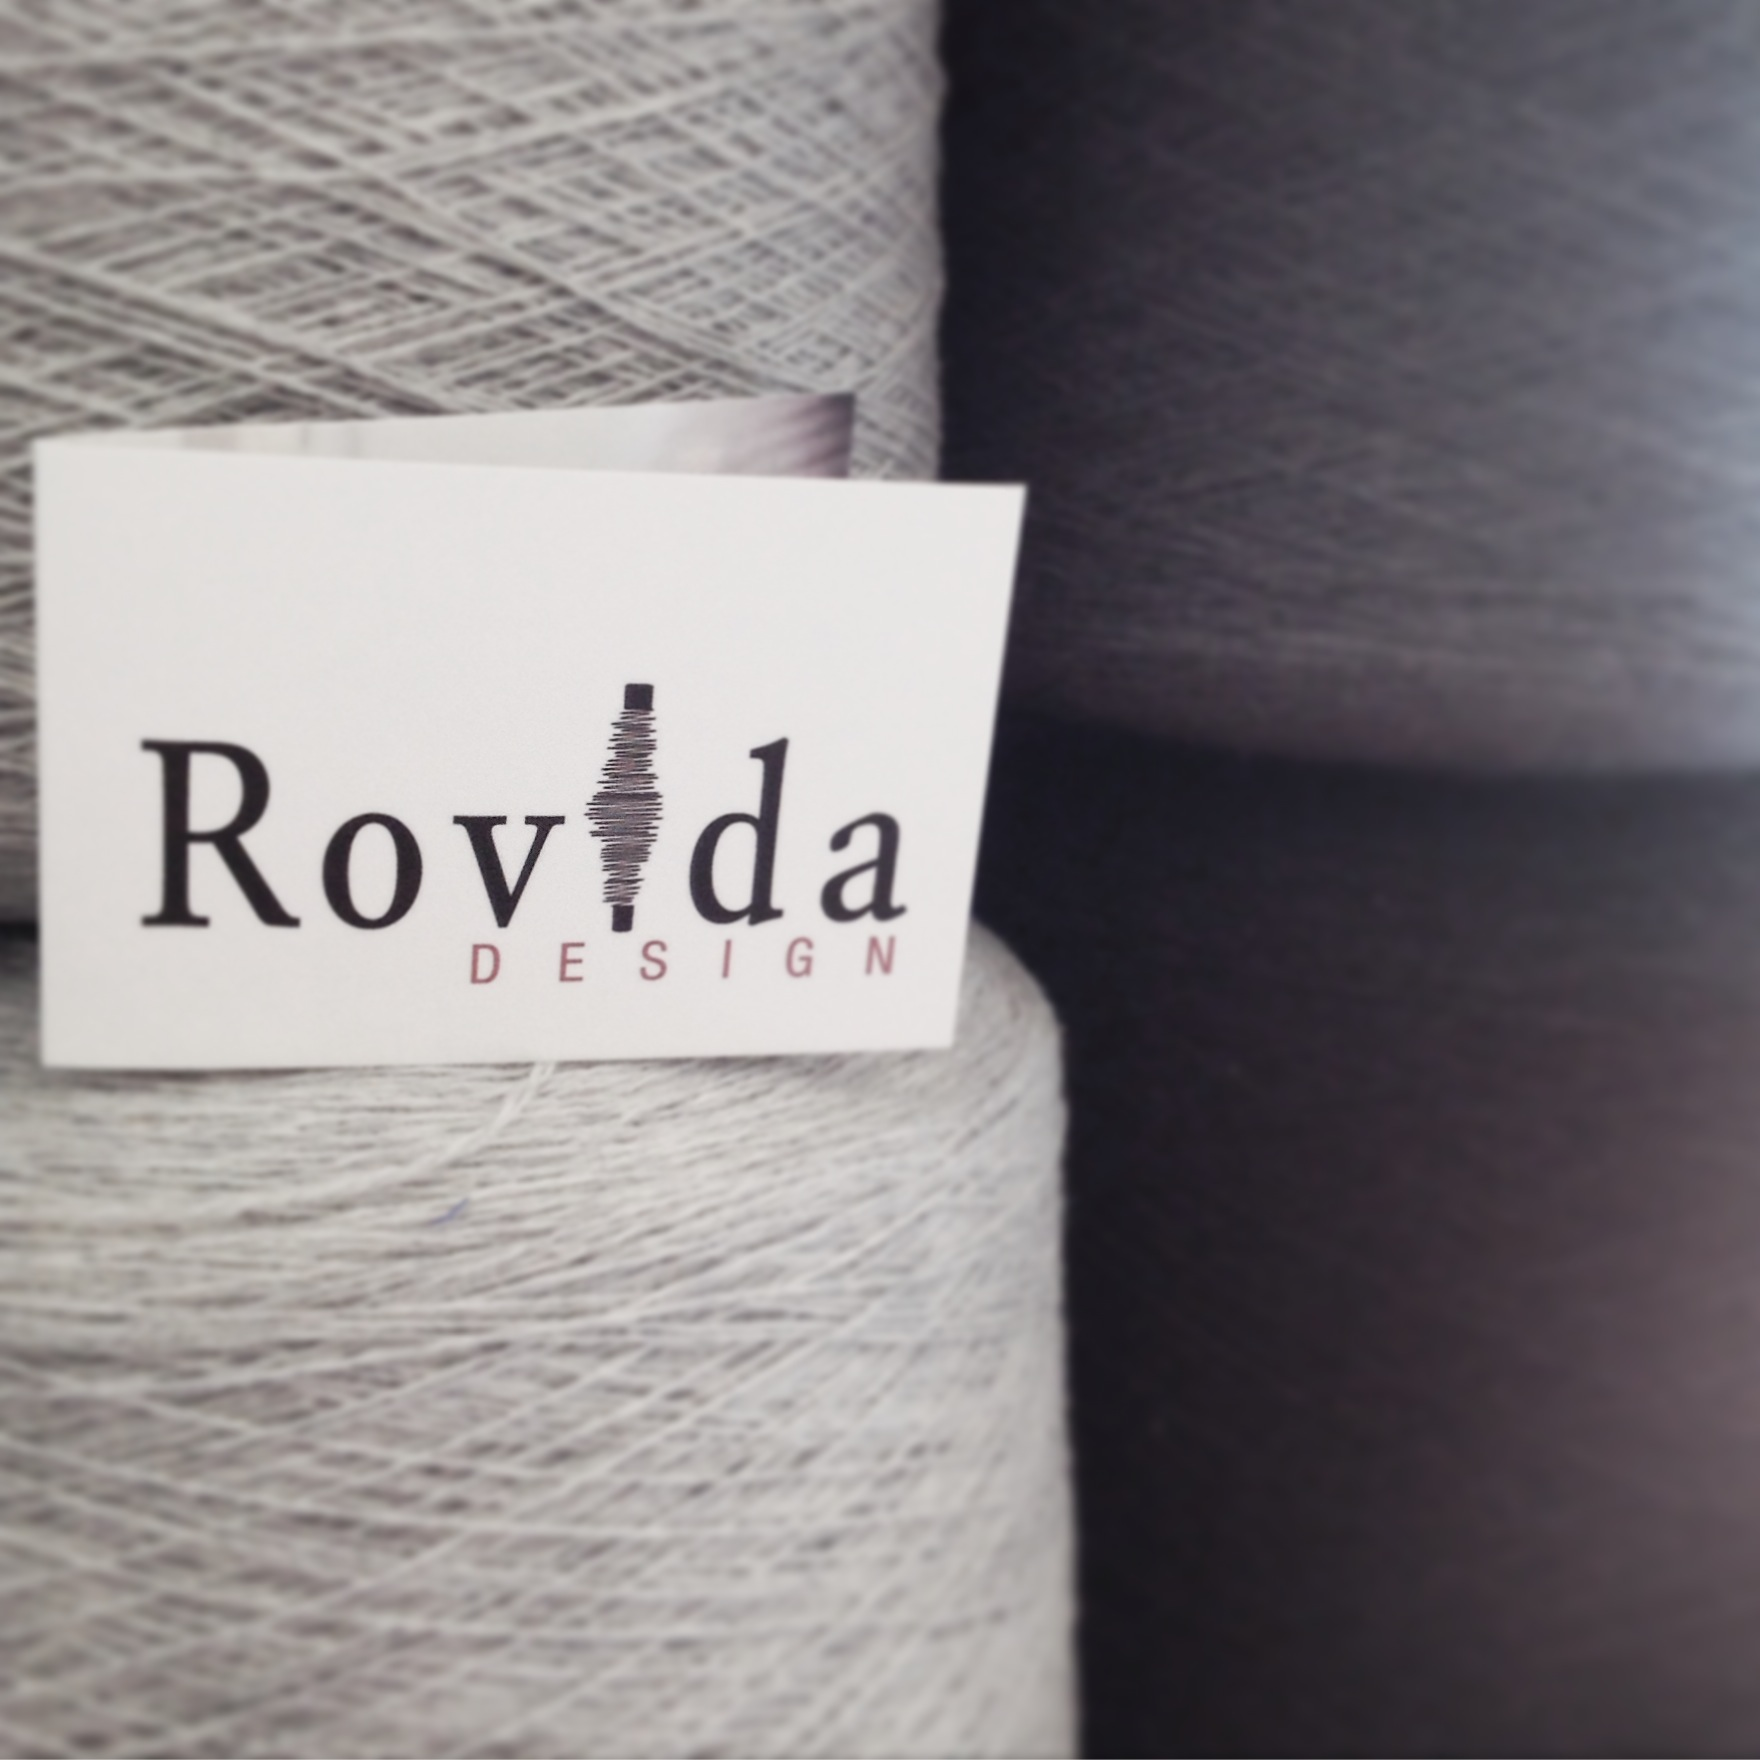 MOSTRA ROVIDA 16 AGOSTO 2017 (39).JPG